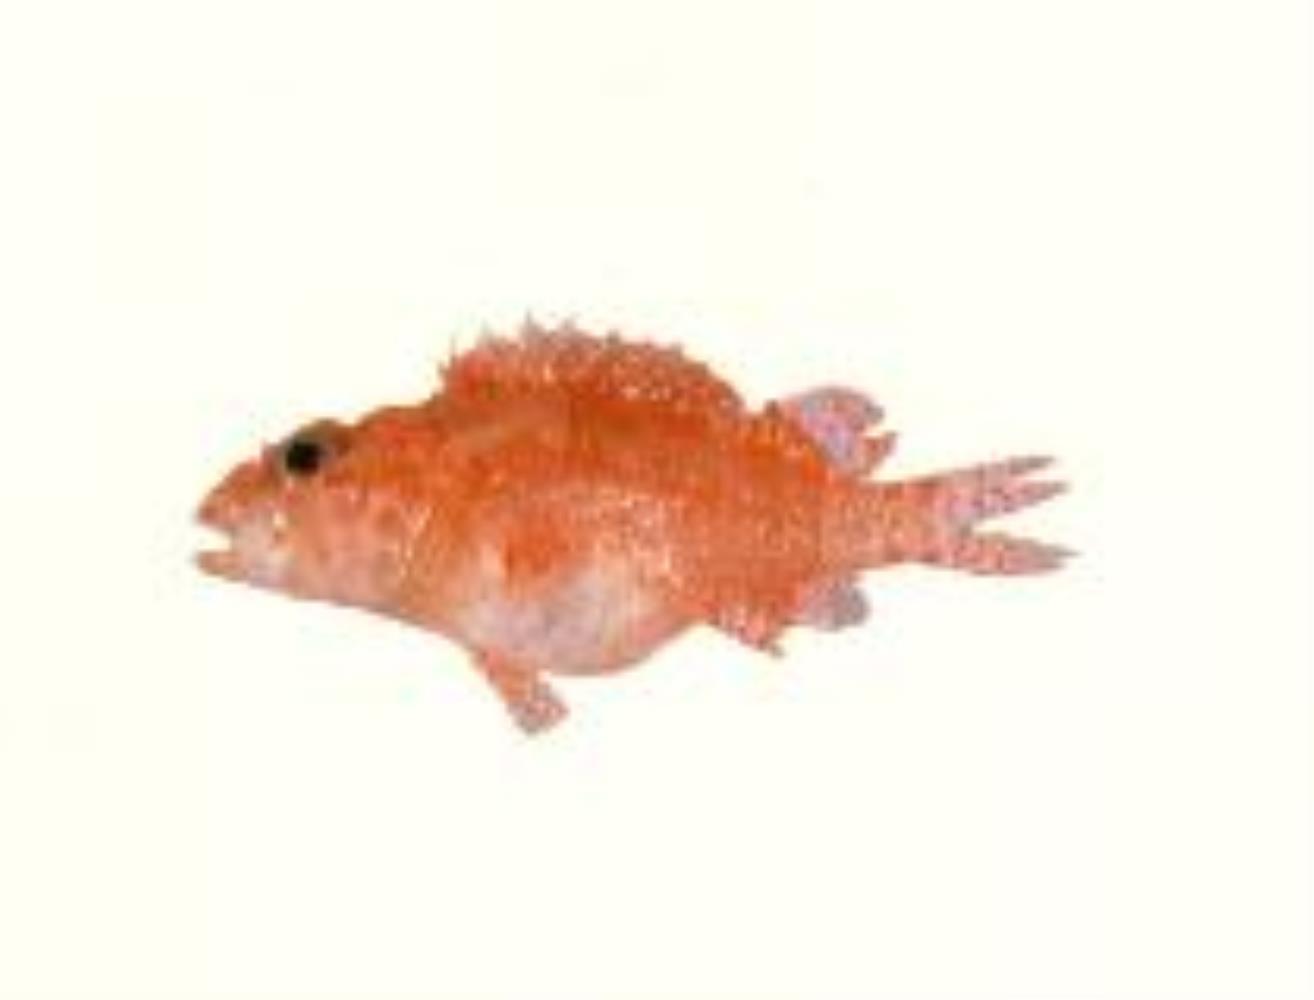 Little Scorpionfish